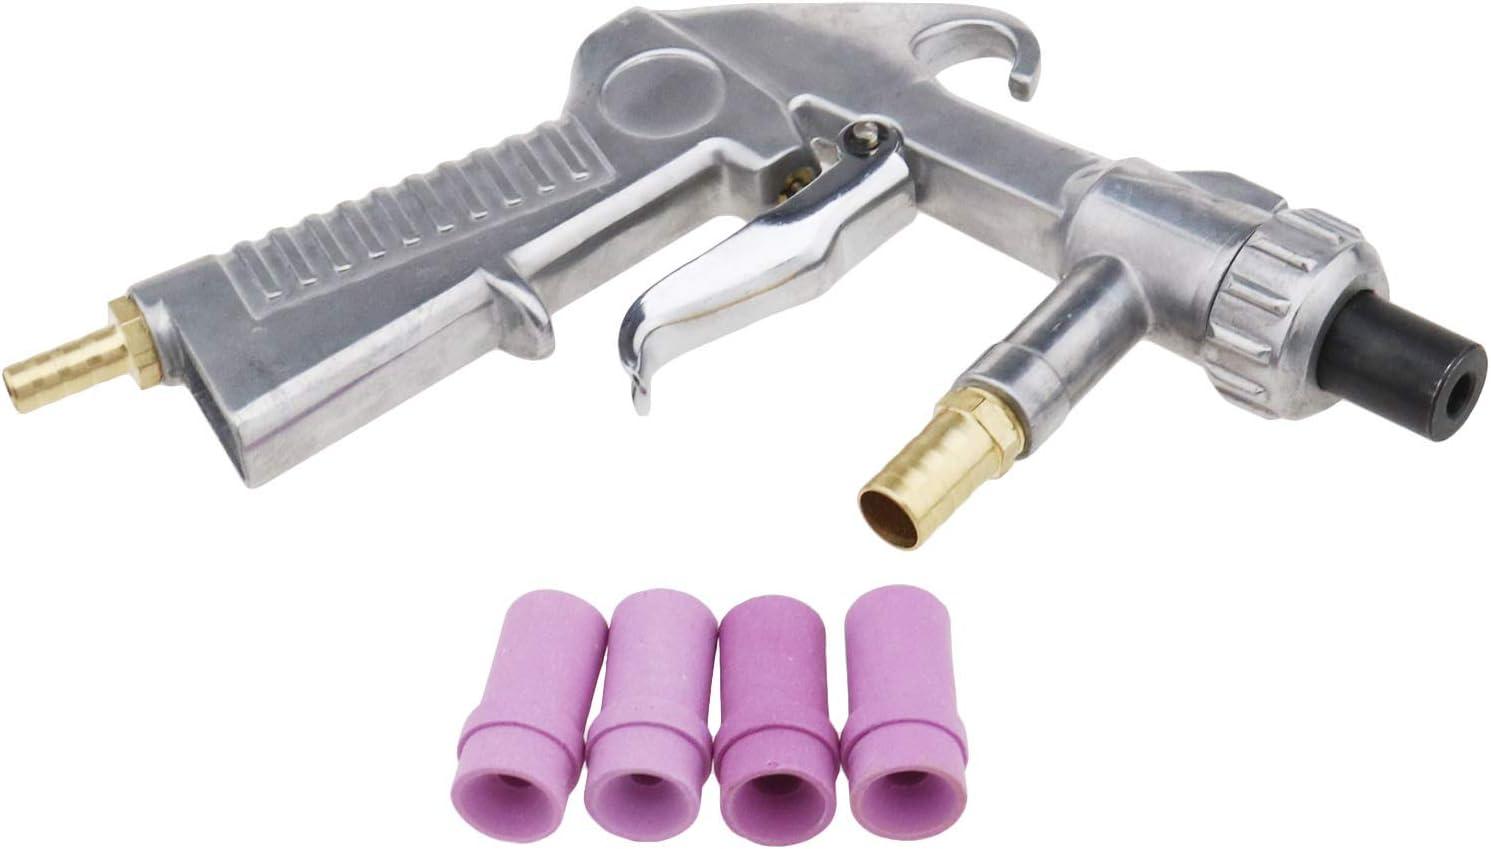 ENET 8 in 1 Sandstrahlpistole Sandstrahlpistole Luftsiphon 4,5 mm//5 mm//6 mm//7 mm Keramikd/üsen-Set